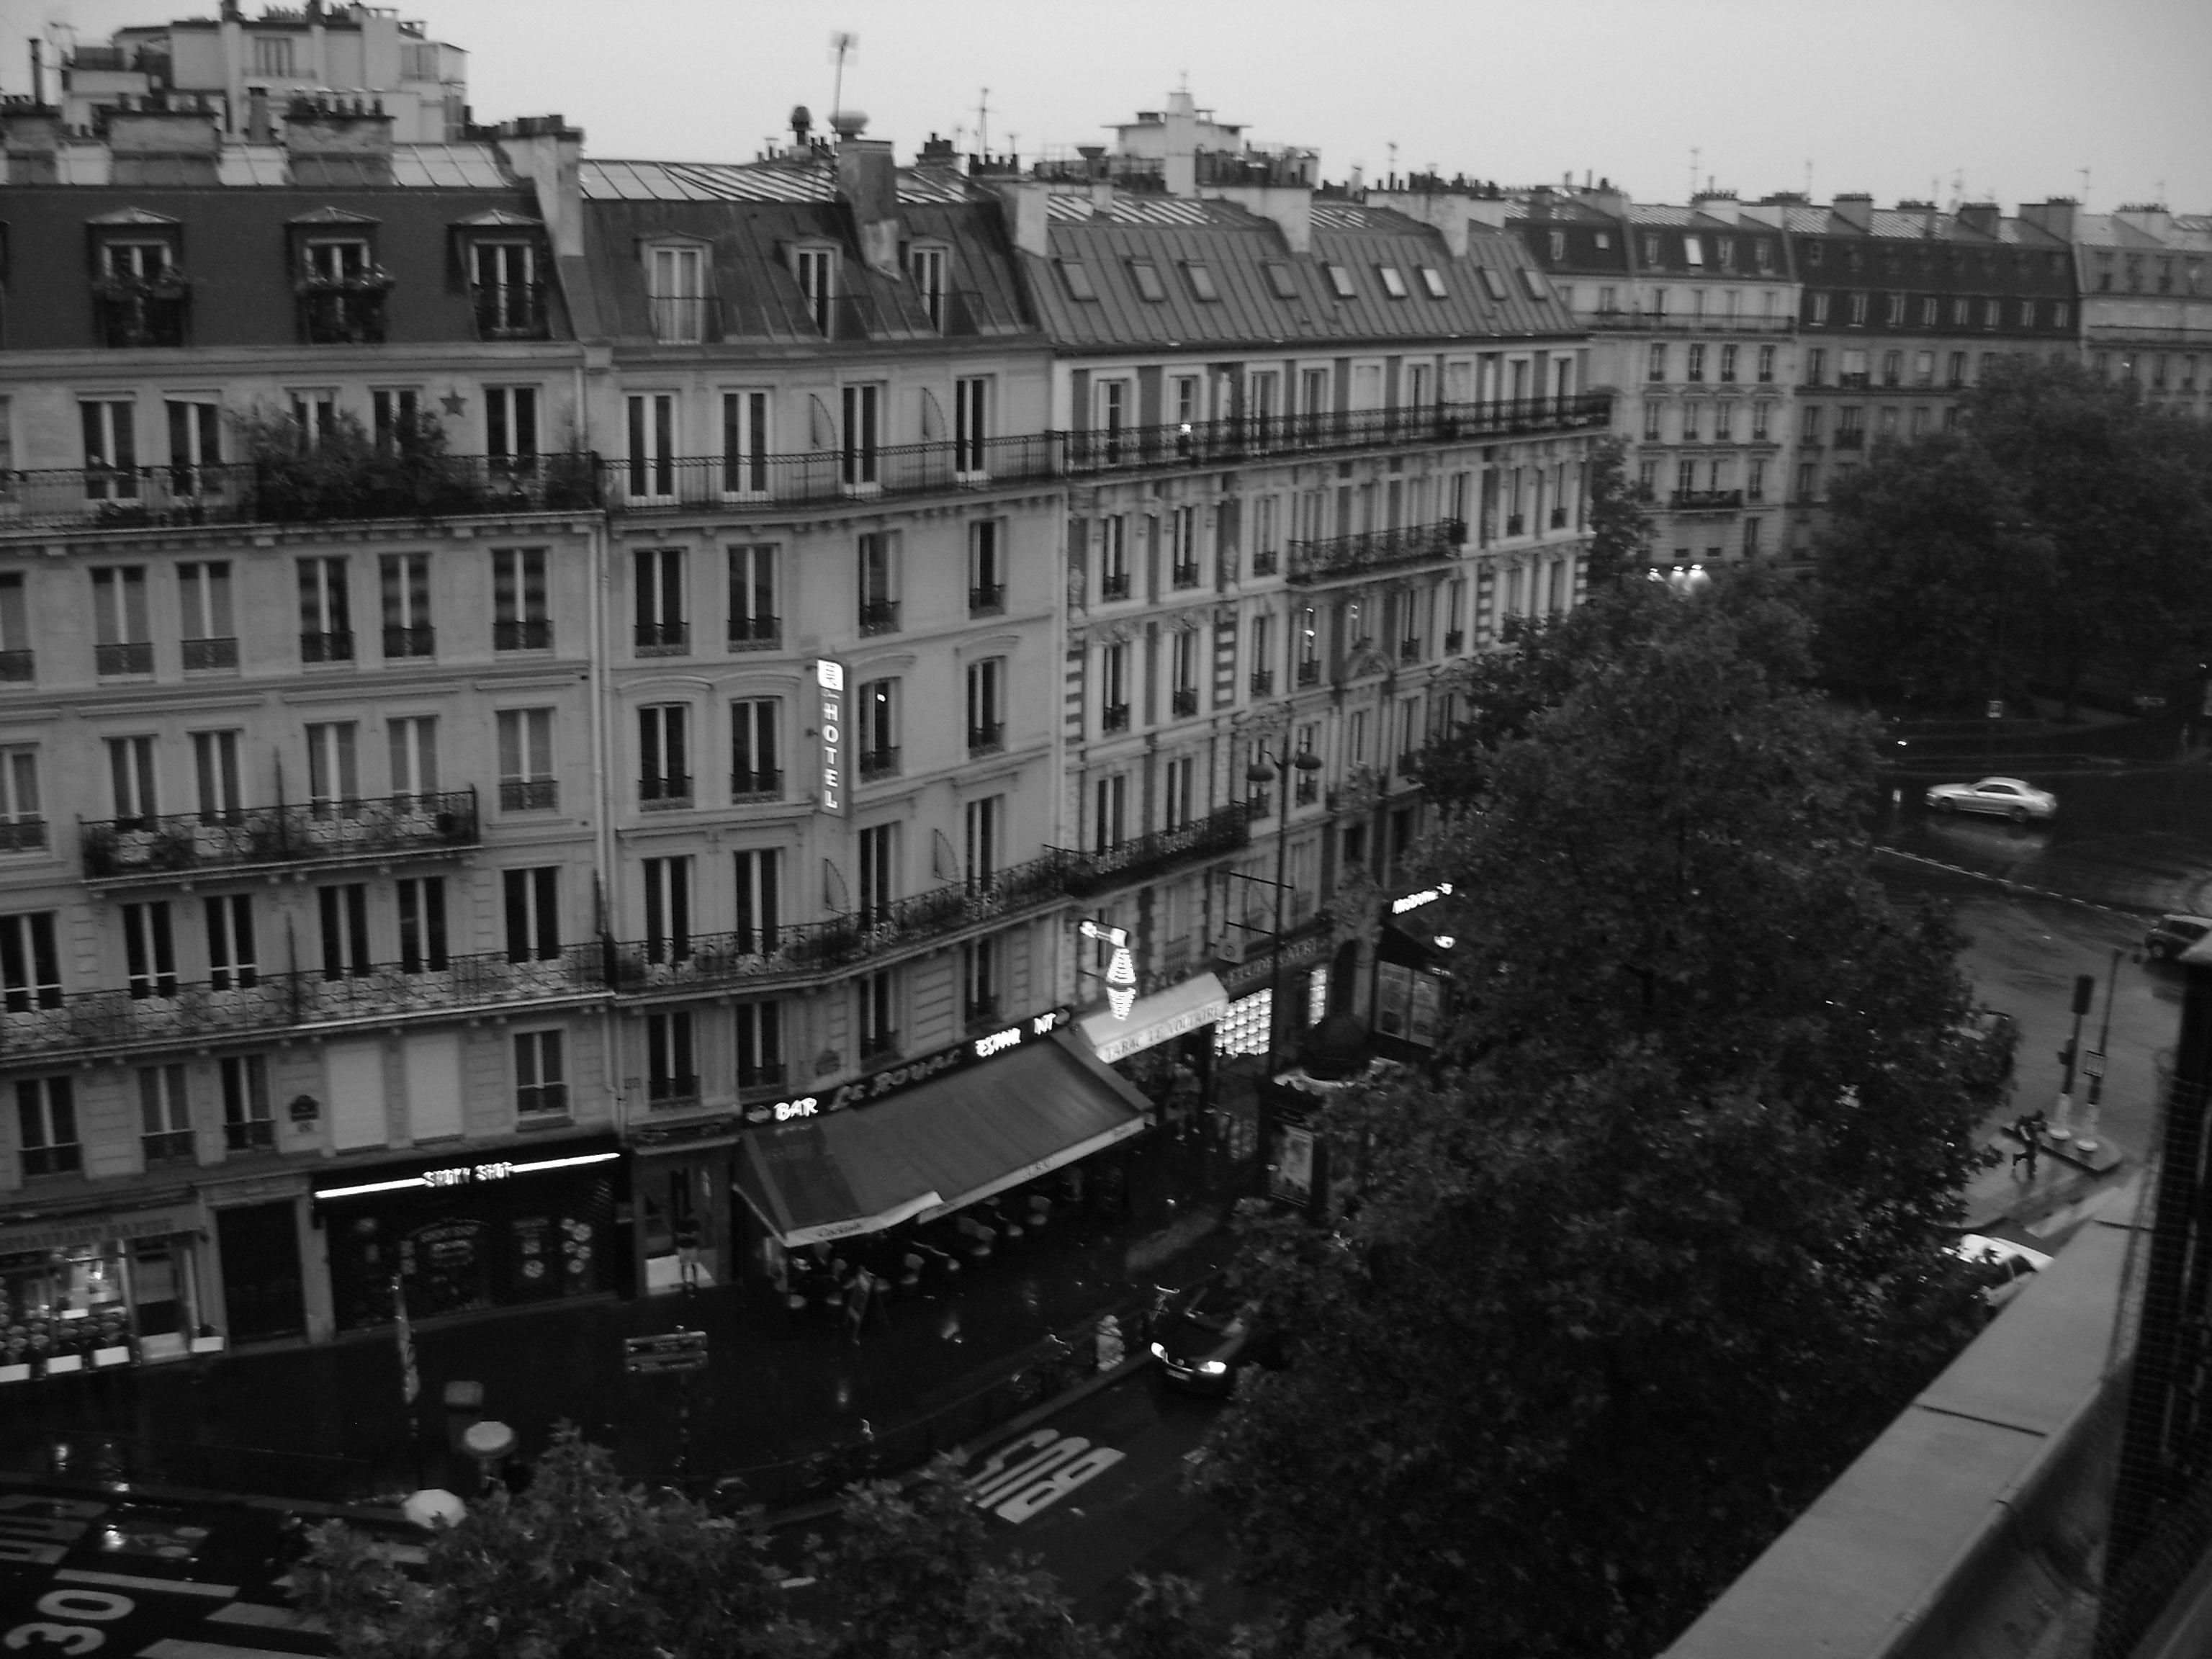 Parigi-11-mm-Blum